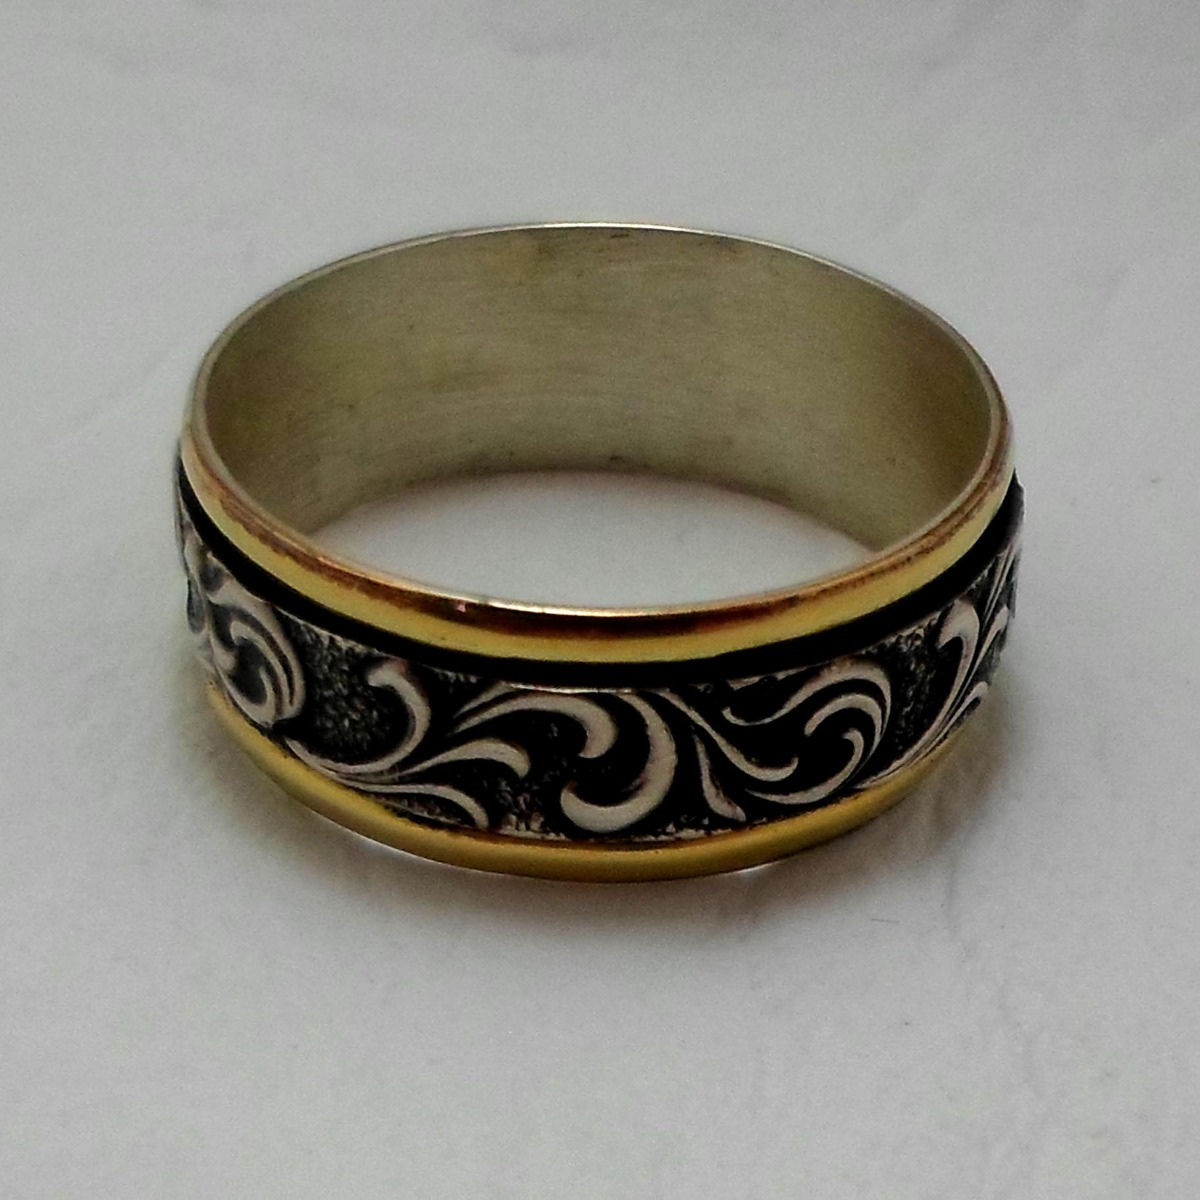 81a3a7e5c26c anillo plata con oro18 kts con ondas alianza nro 32 unisex. Cargando zoom.